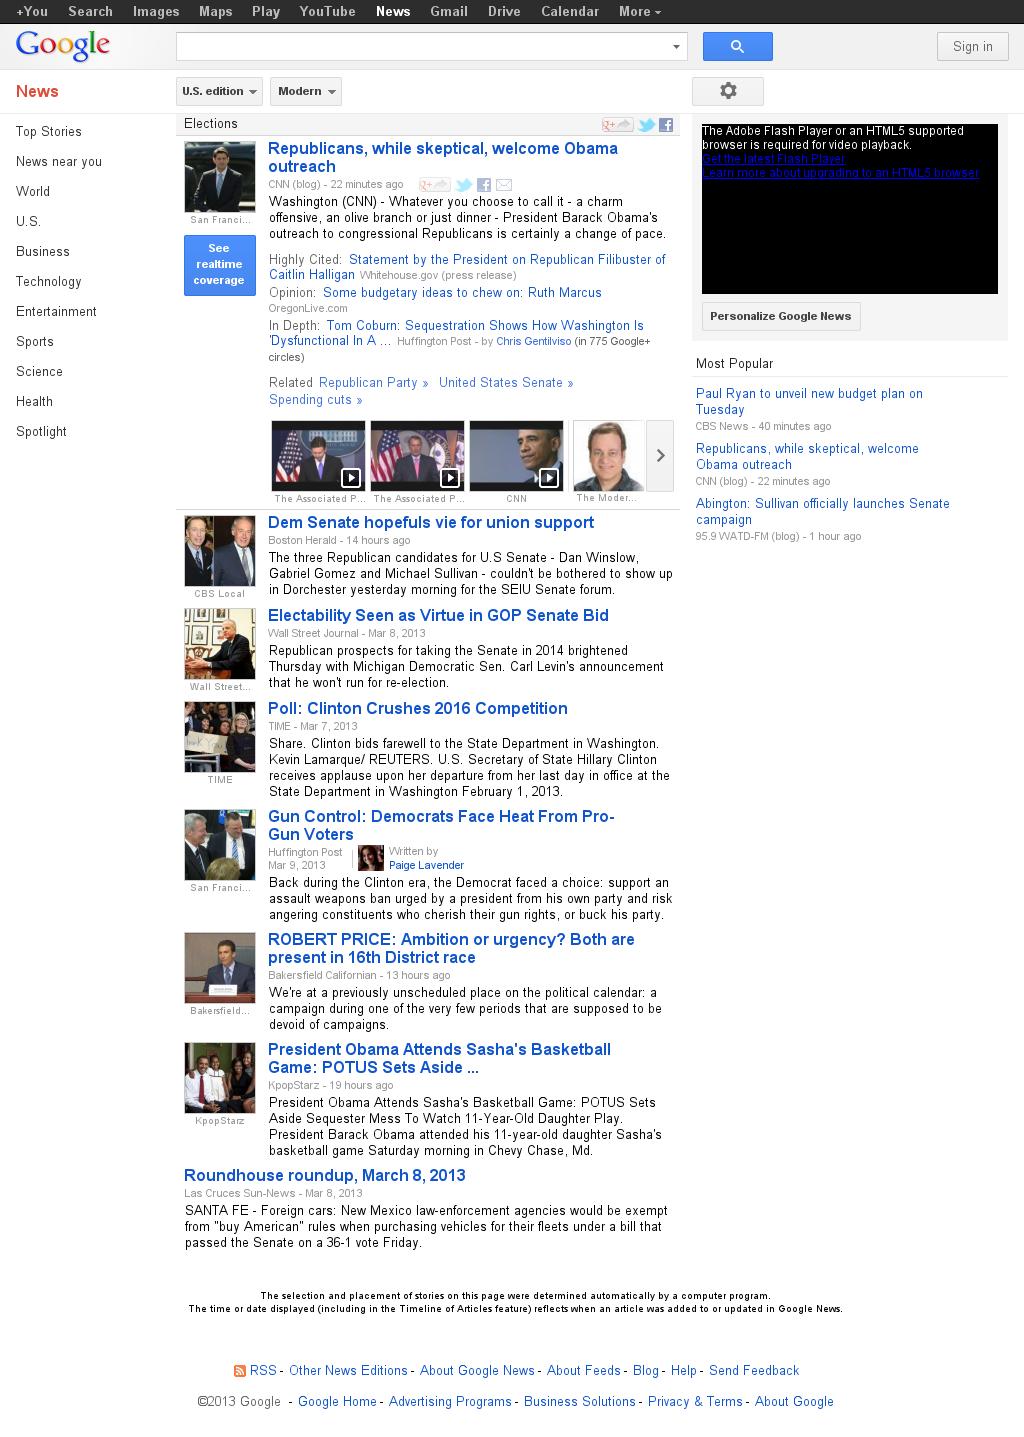 Google News: Elections at Sunday March 10, 2013, 7:07 p.m. UTC